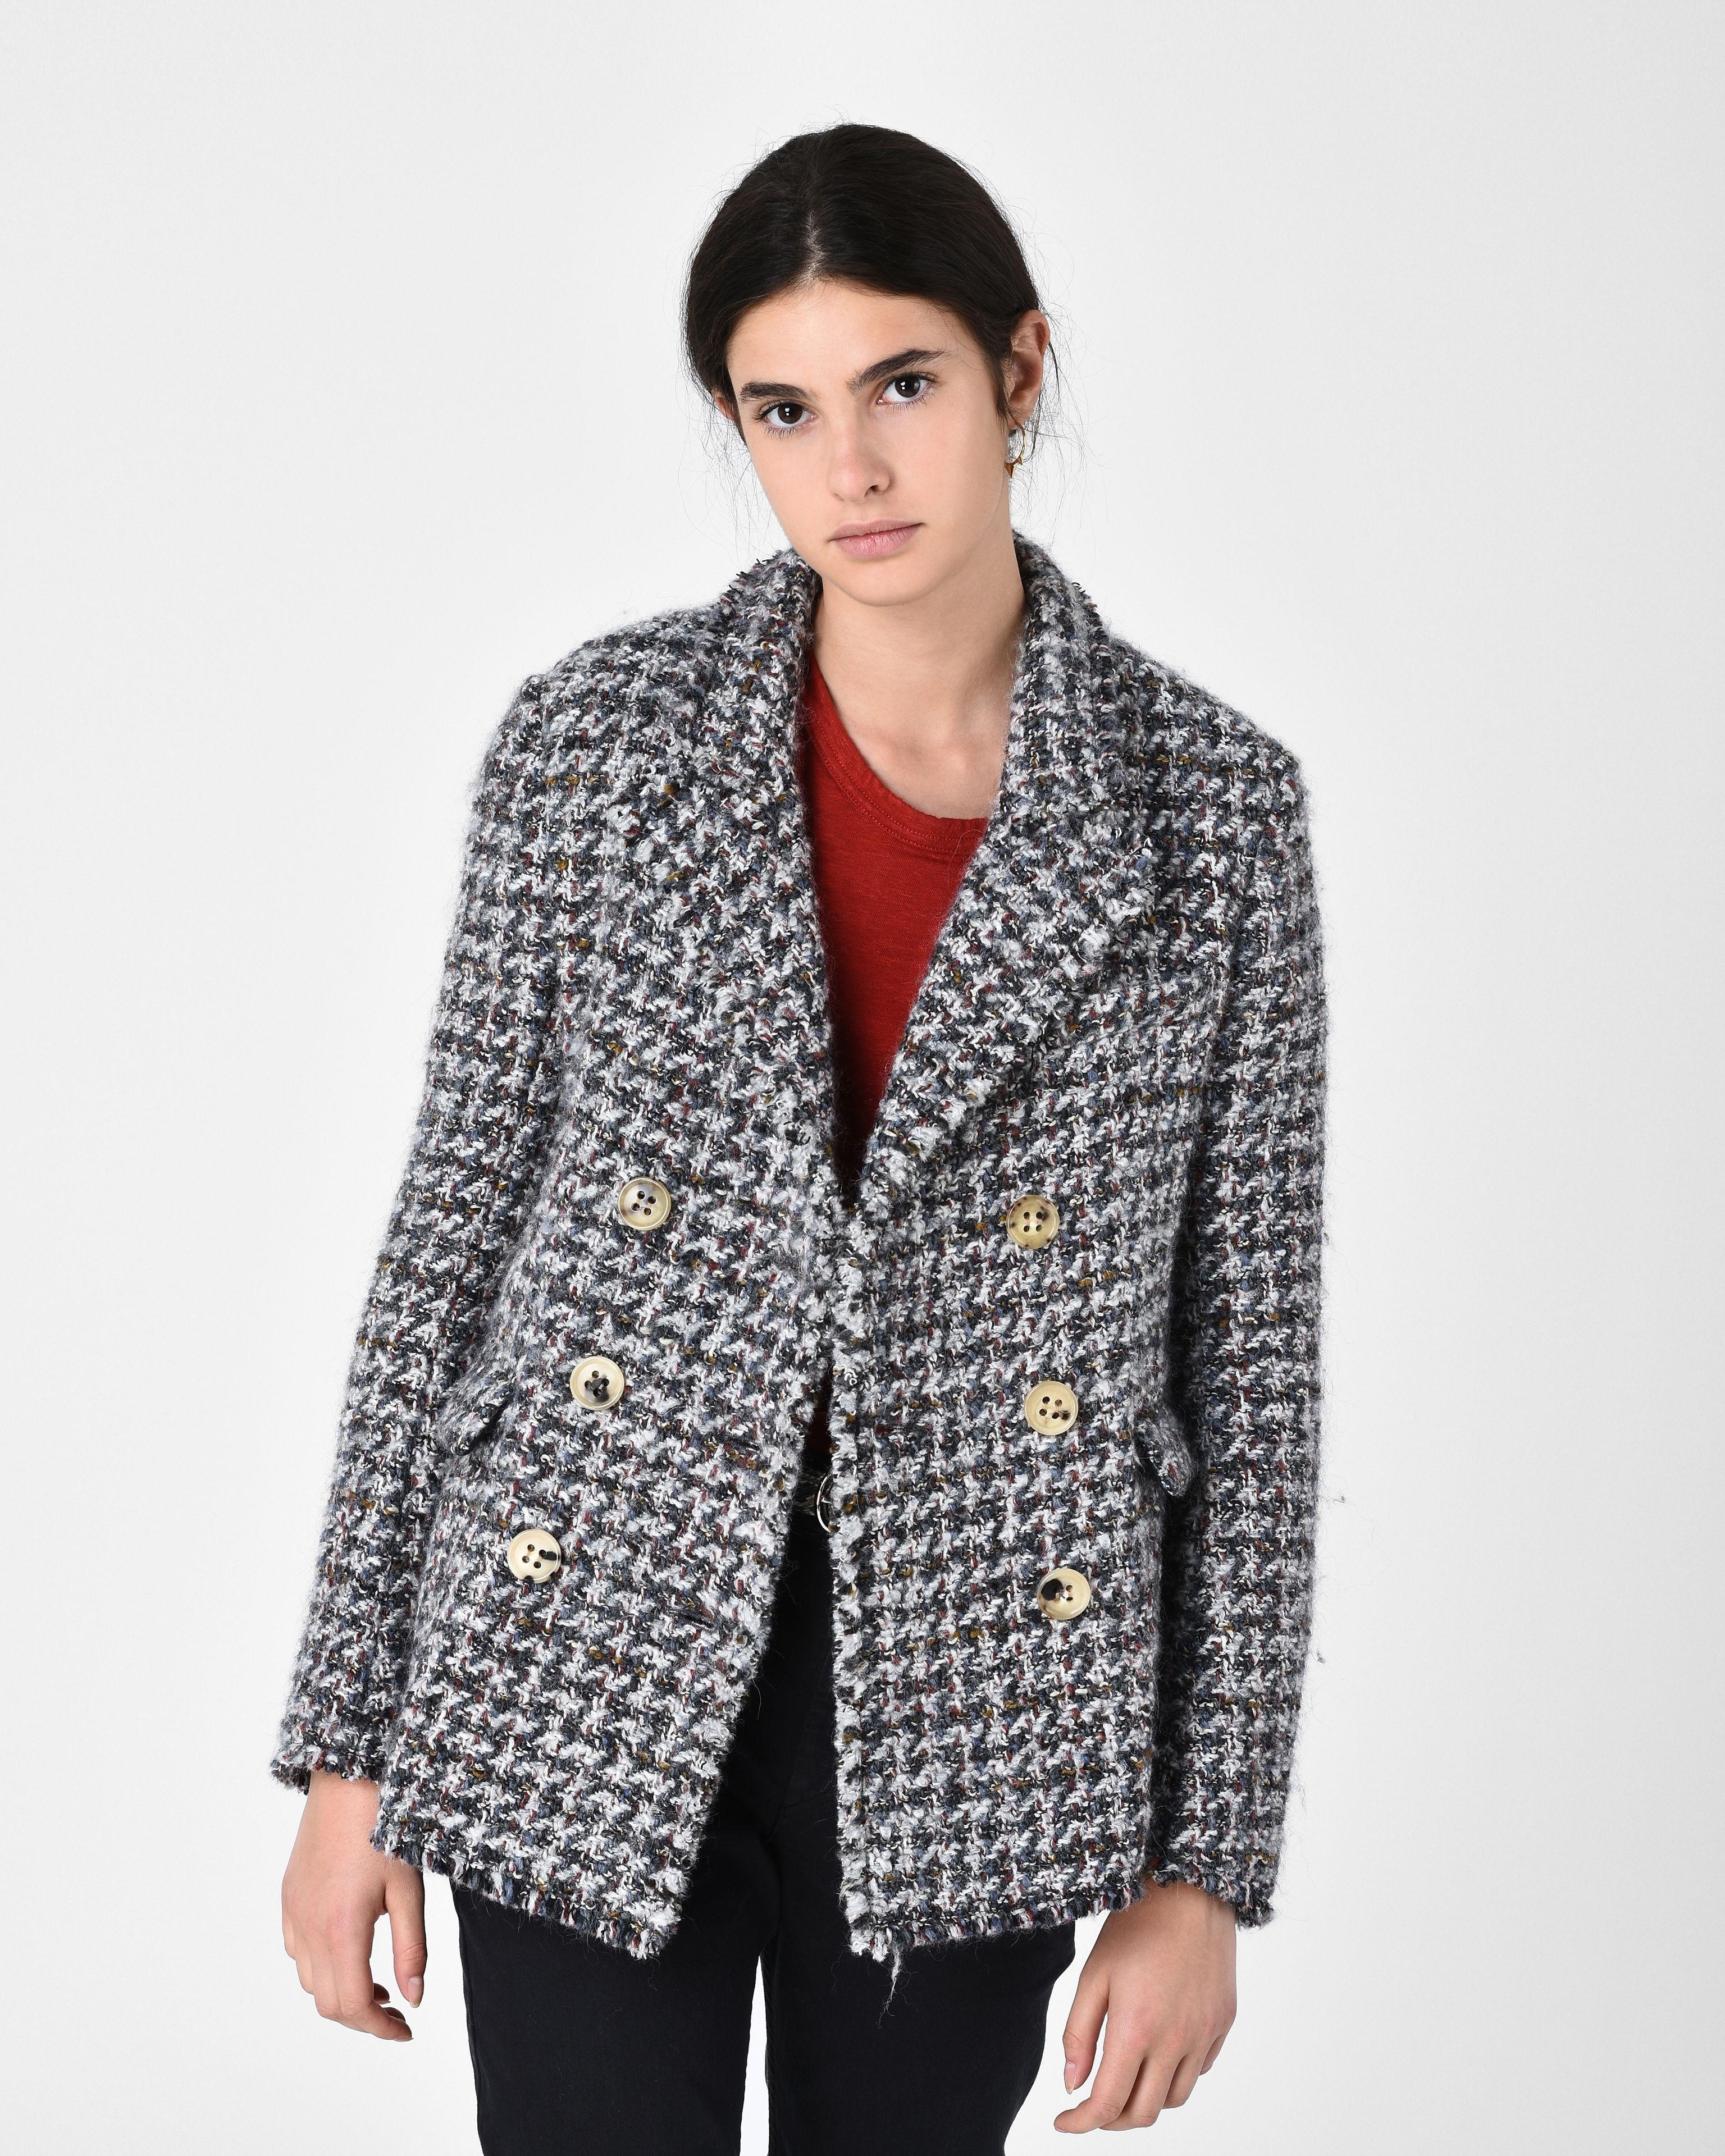 toile isabel marant jady tweed jacket in grey lyst. Black Bedroom Furniture Sets. Home Design Ideas